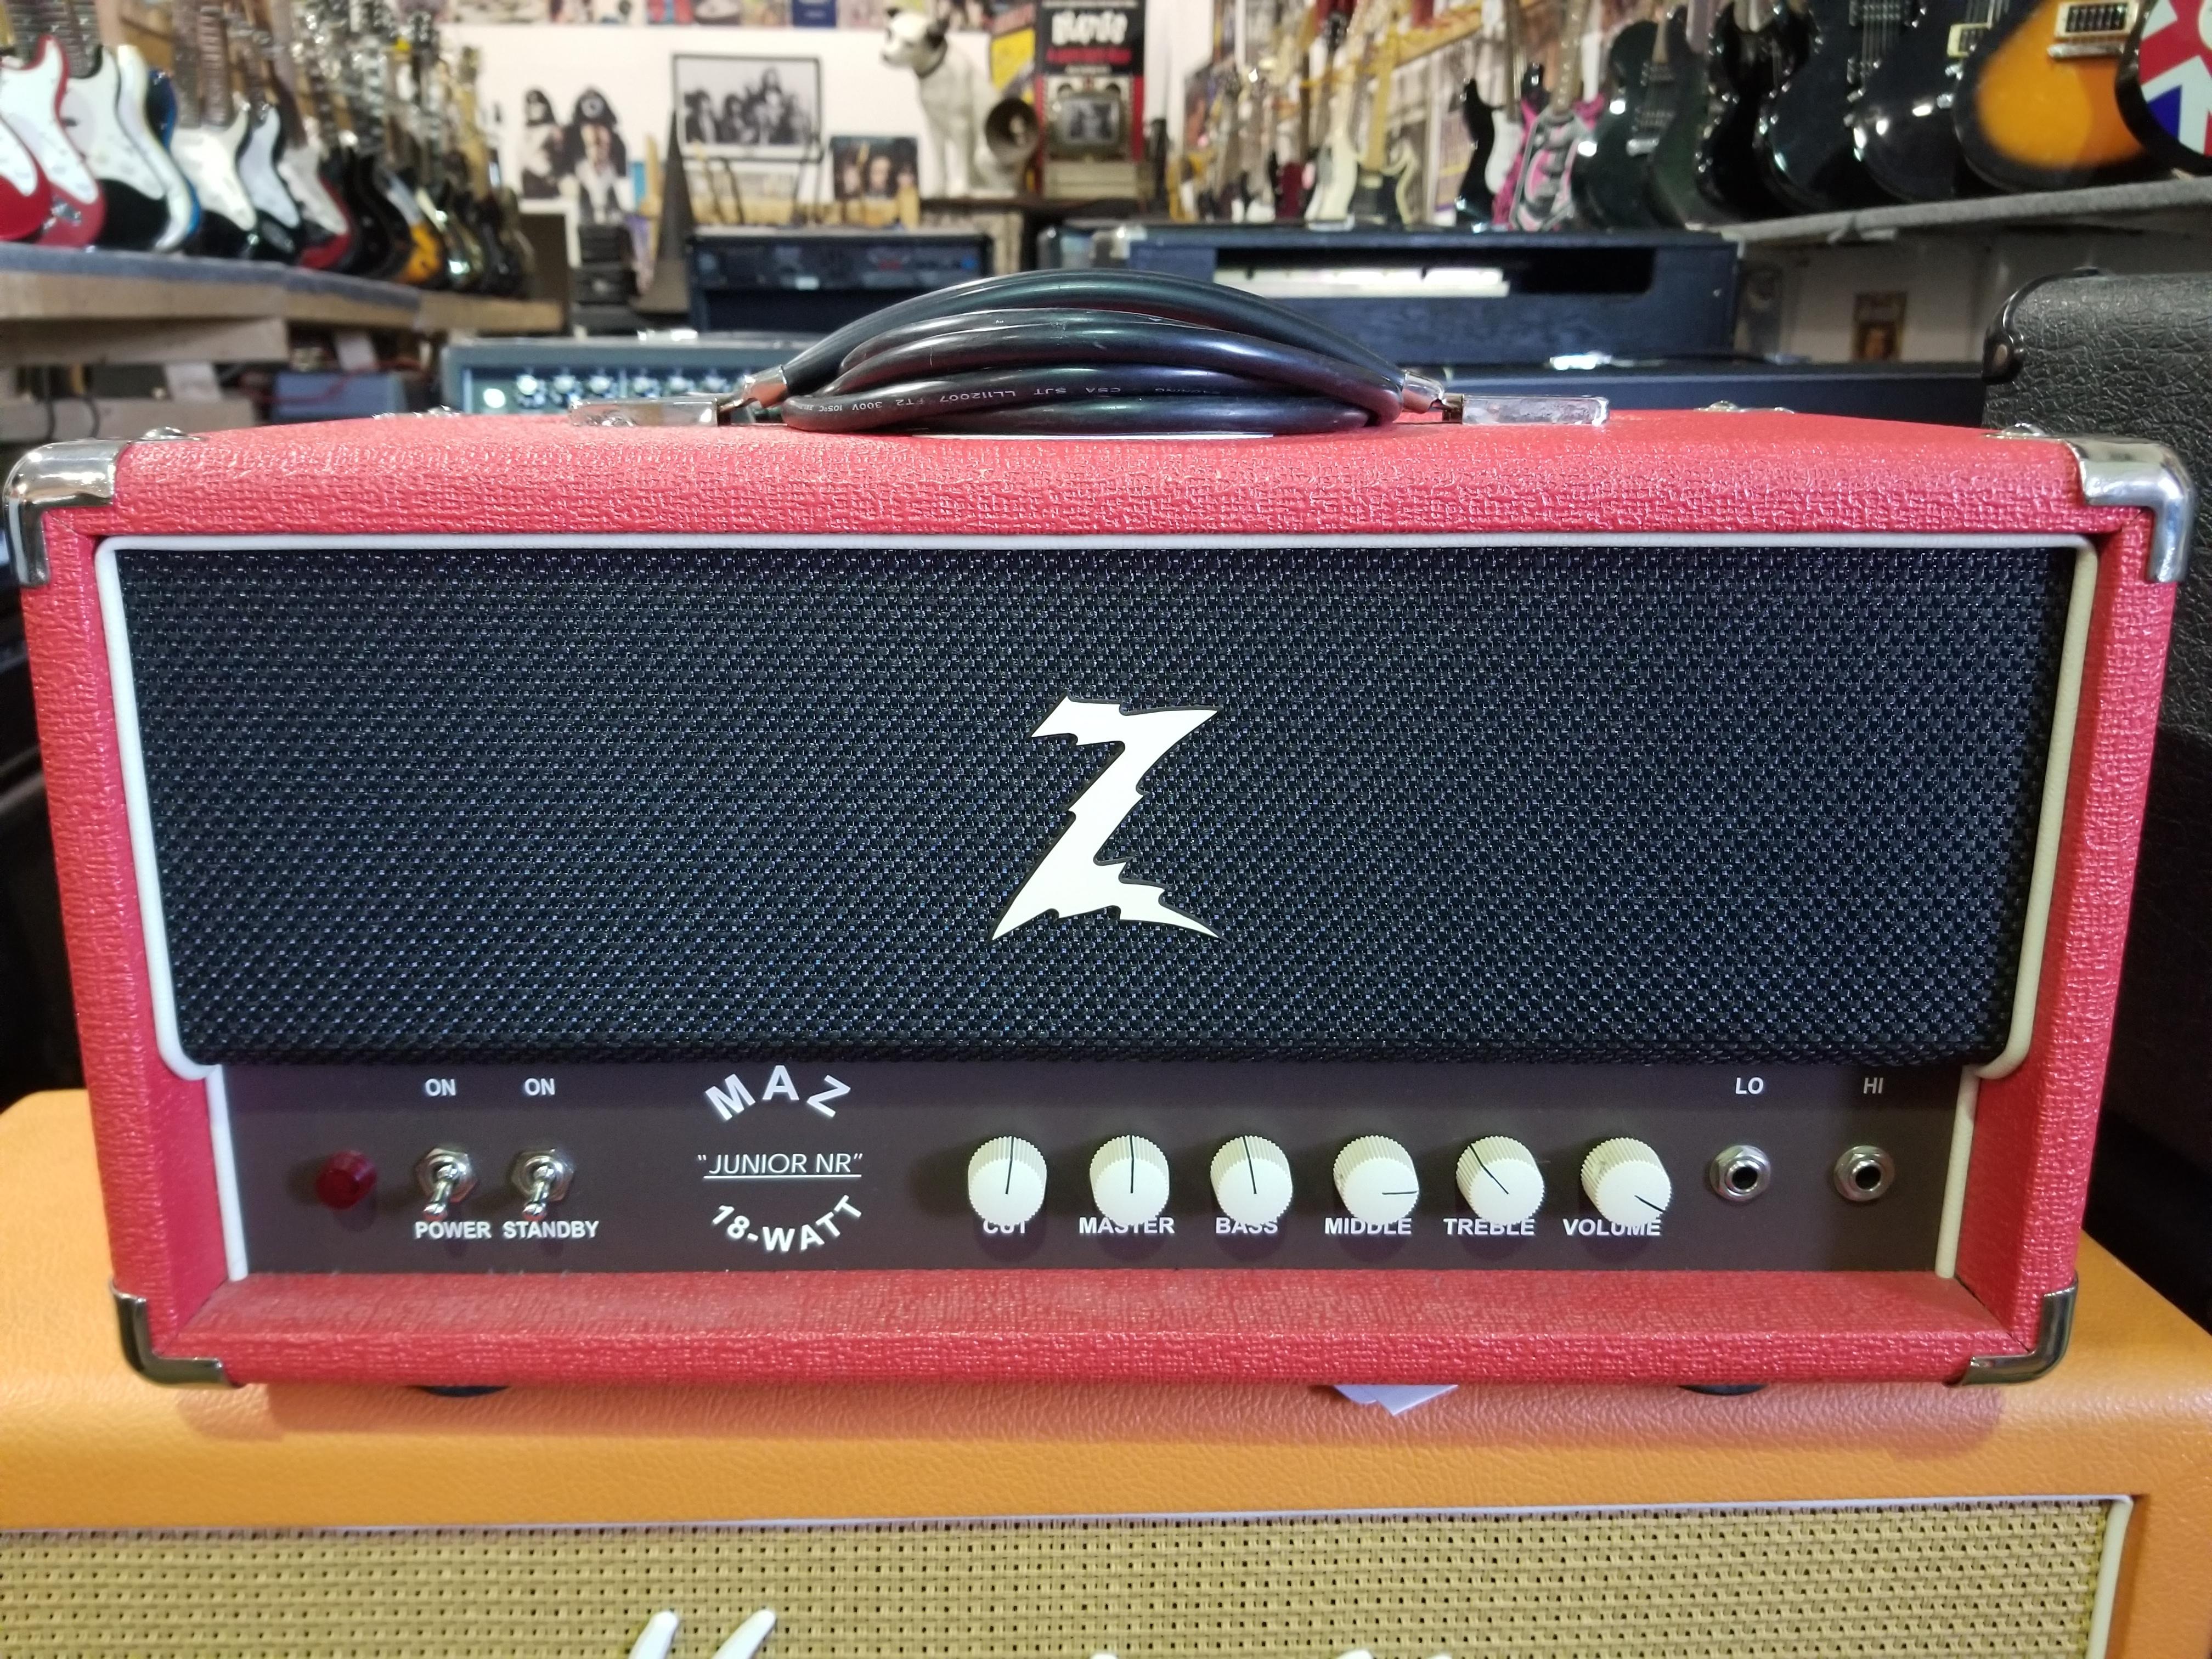 DR. Z MAZ JUNIOR NR 18-Watt Tube Amp Head - Local Pickup Only!